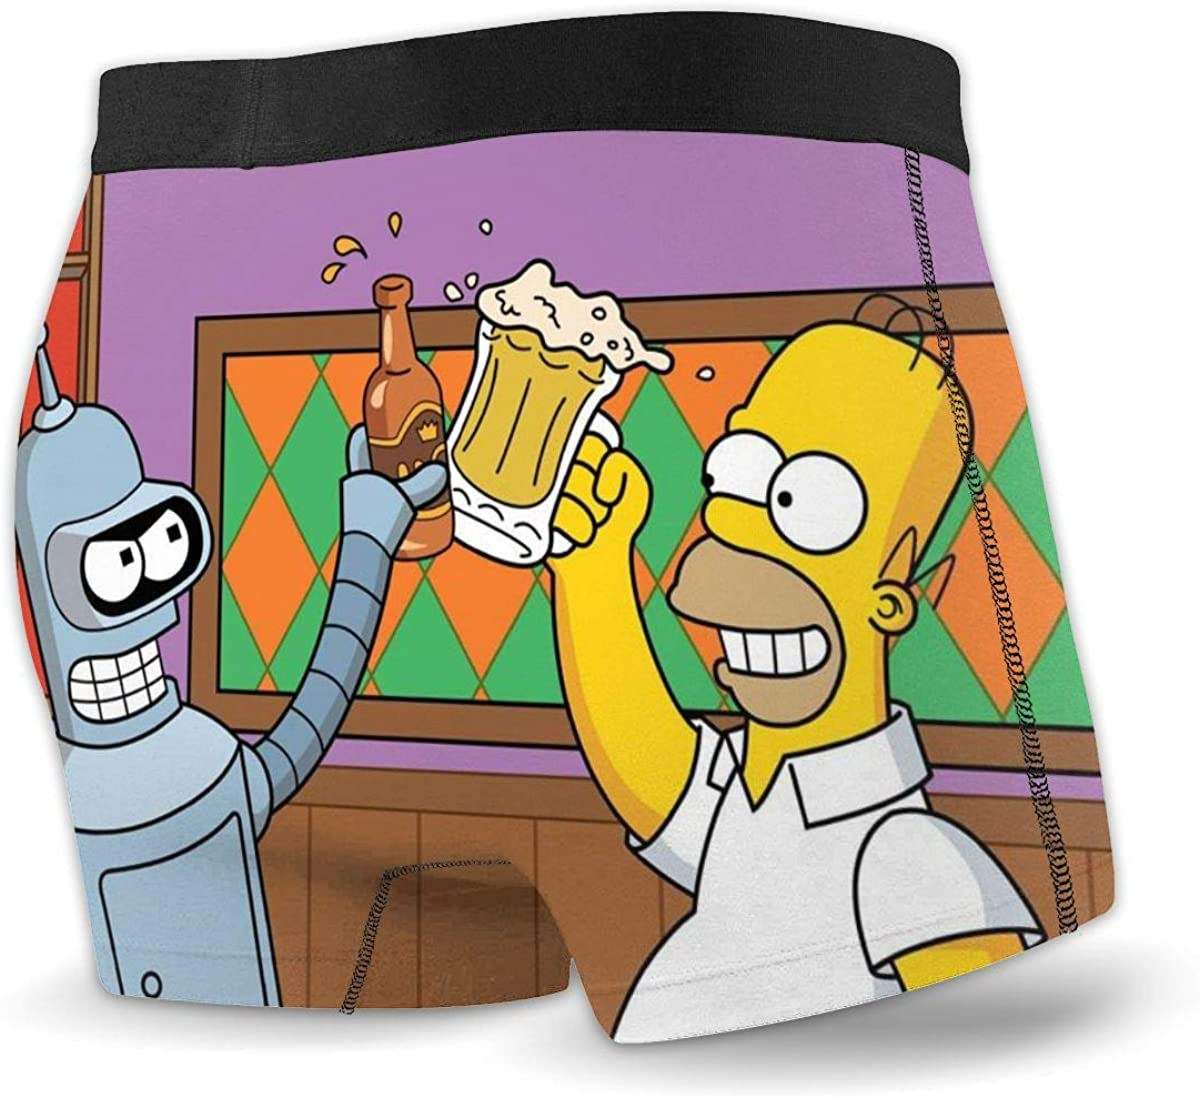 Yellowbiubiubiu Simpsons Cartoon Anime Mens Underwear Stretch Boxers Briefs for Men Short Leg Underpants Breathable Comfortable Fiber Pack